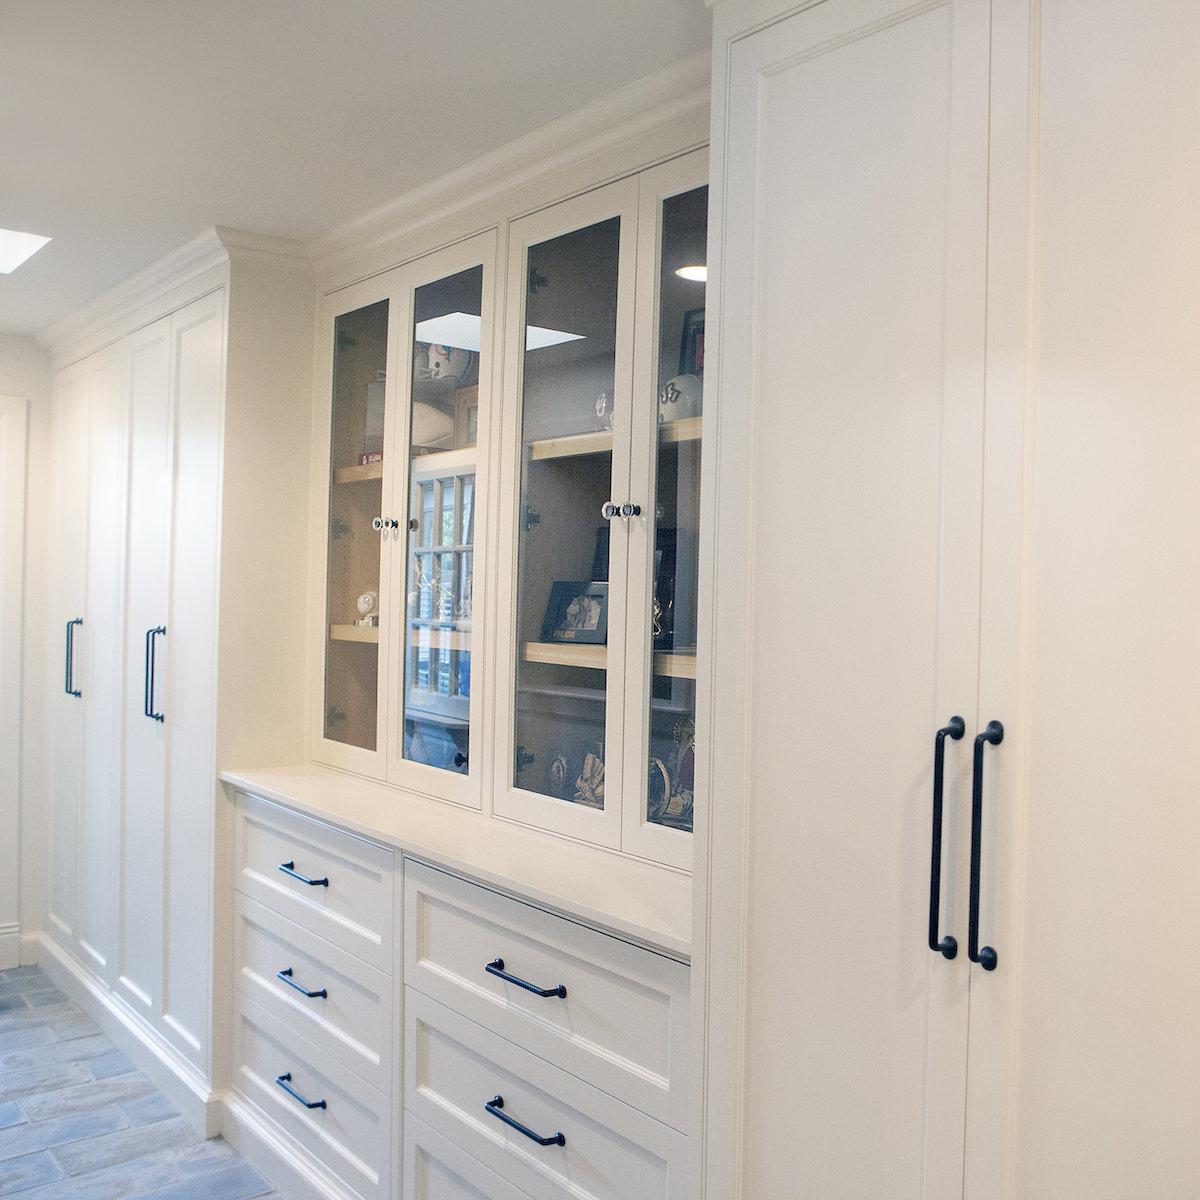 Bathroom Design (Custom Texas Homes): Custom Bath with Claw Foot Tub, Beadboard and Oak Floors